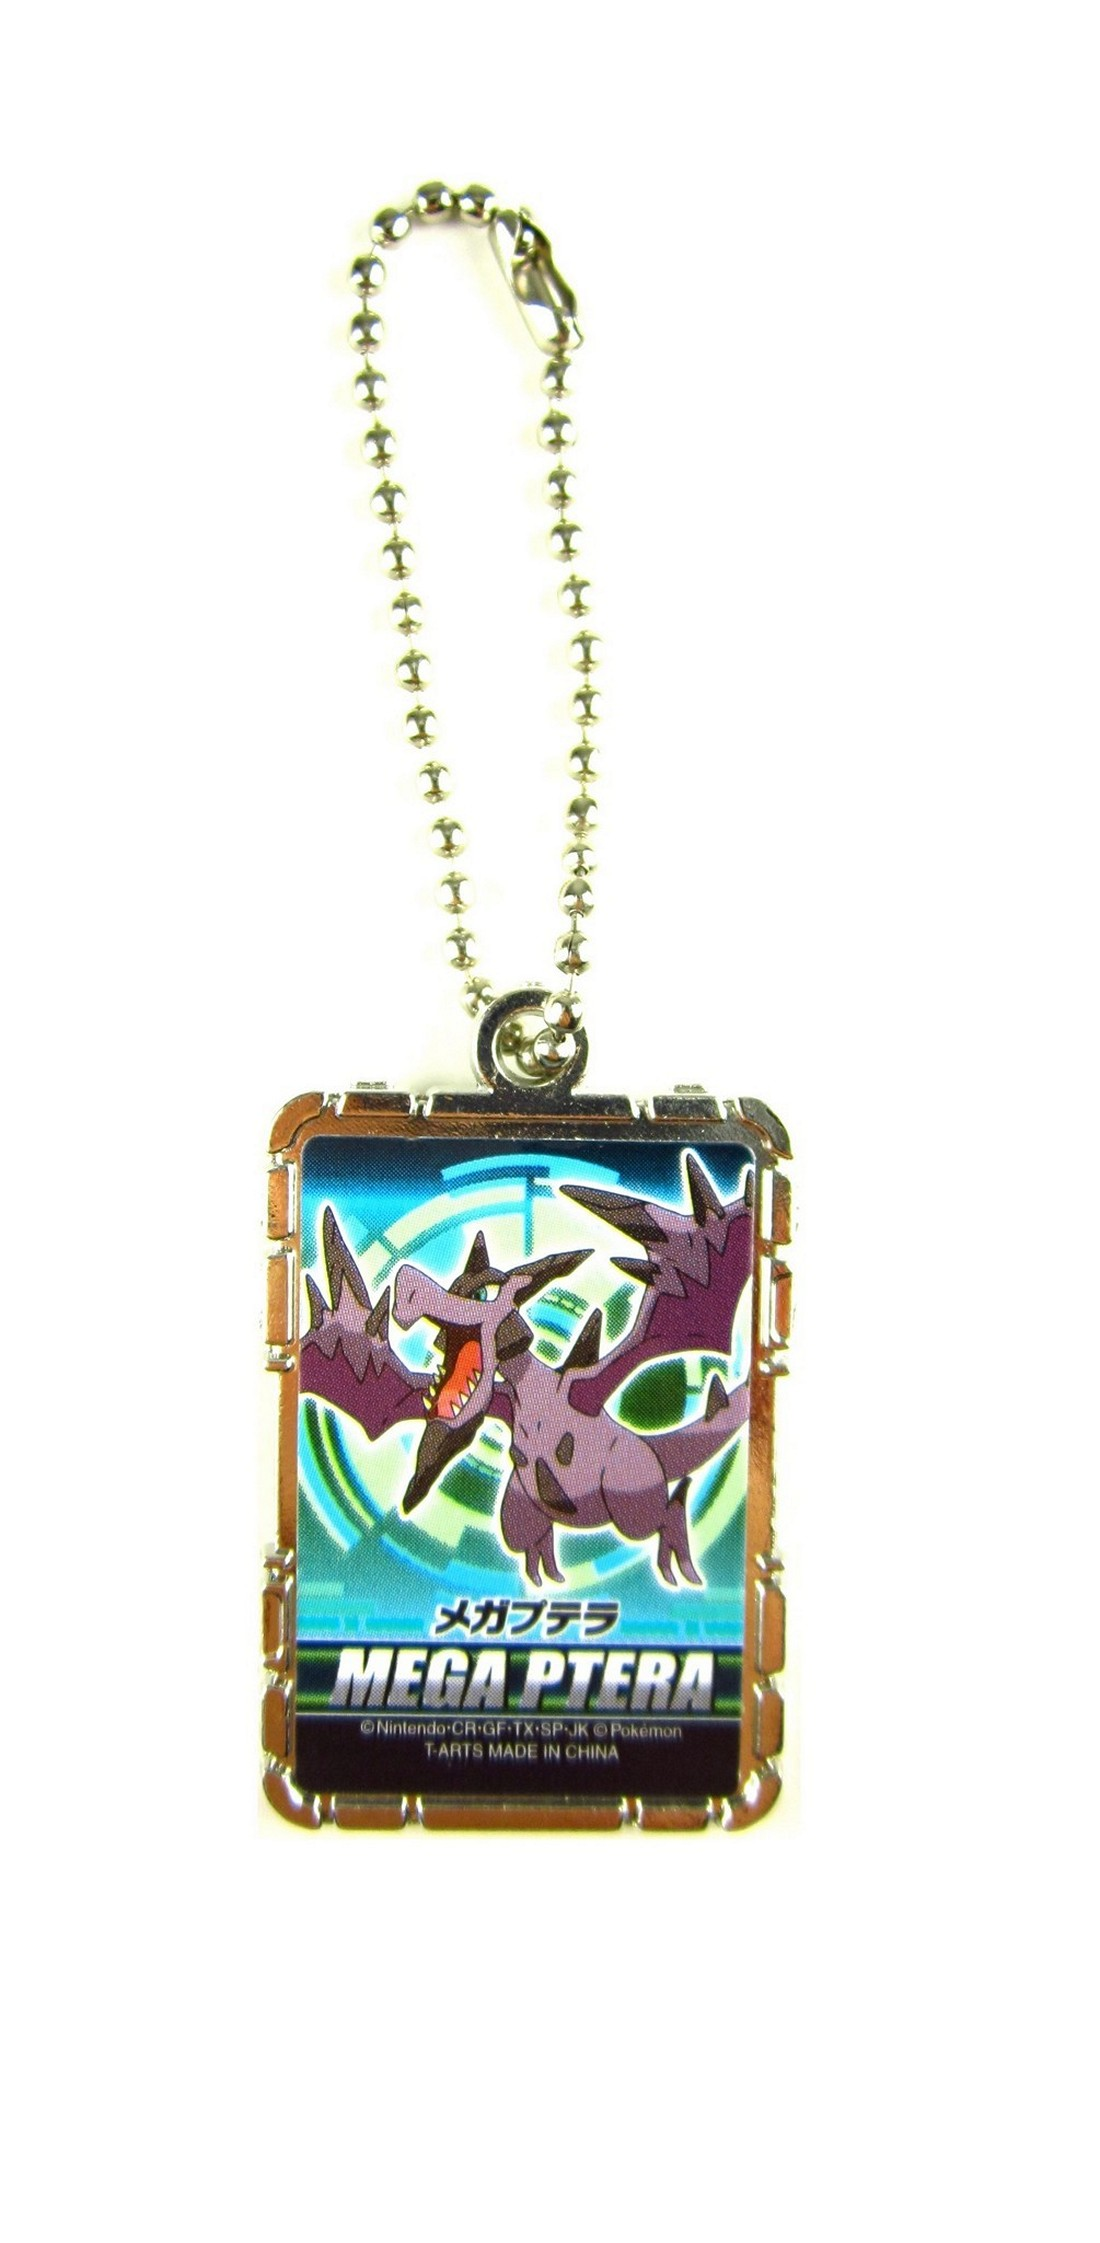 Pokemon xy mega evolution metal keychain 1 4 x 75 mega aerodactyl ptera ebay - Ptera pokemon y ...